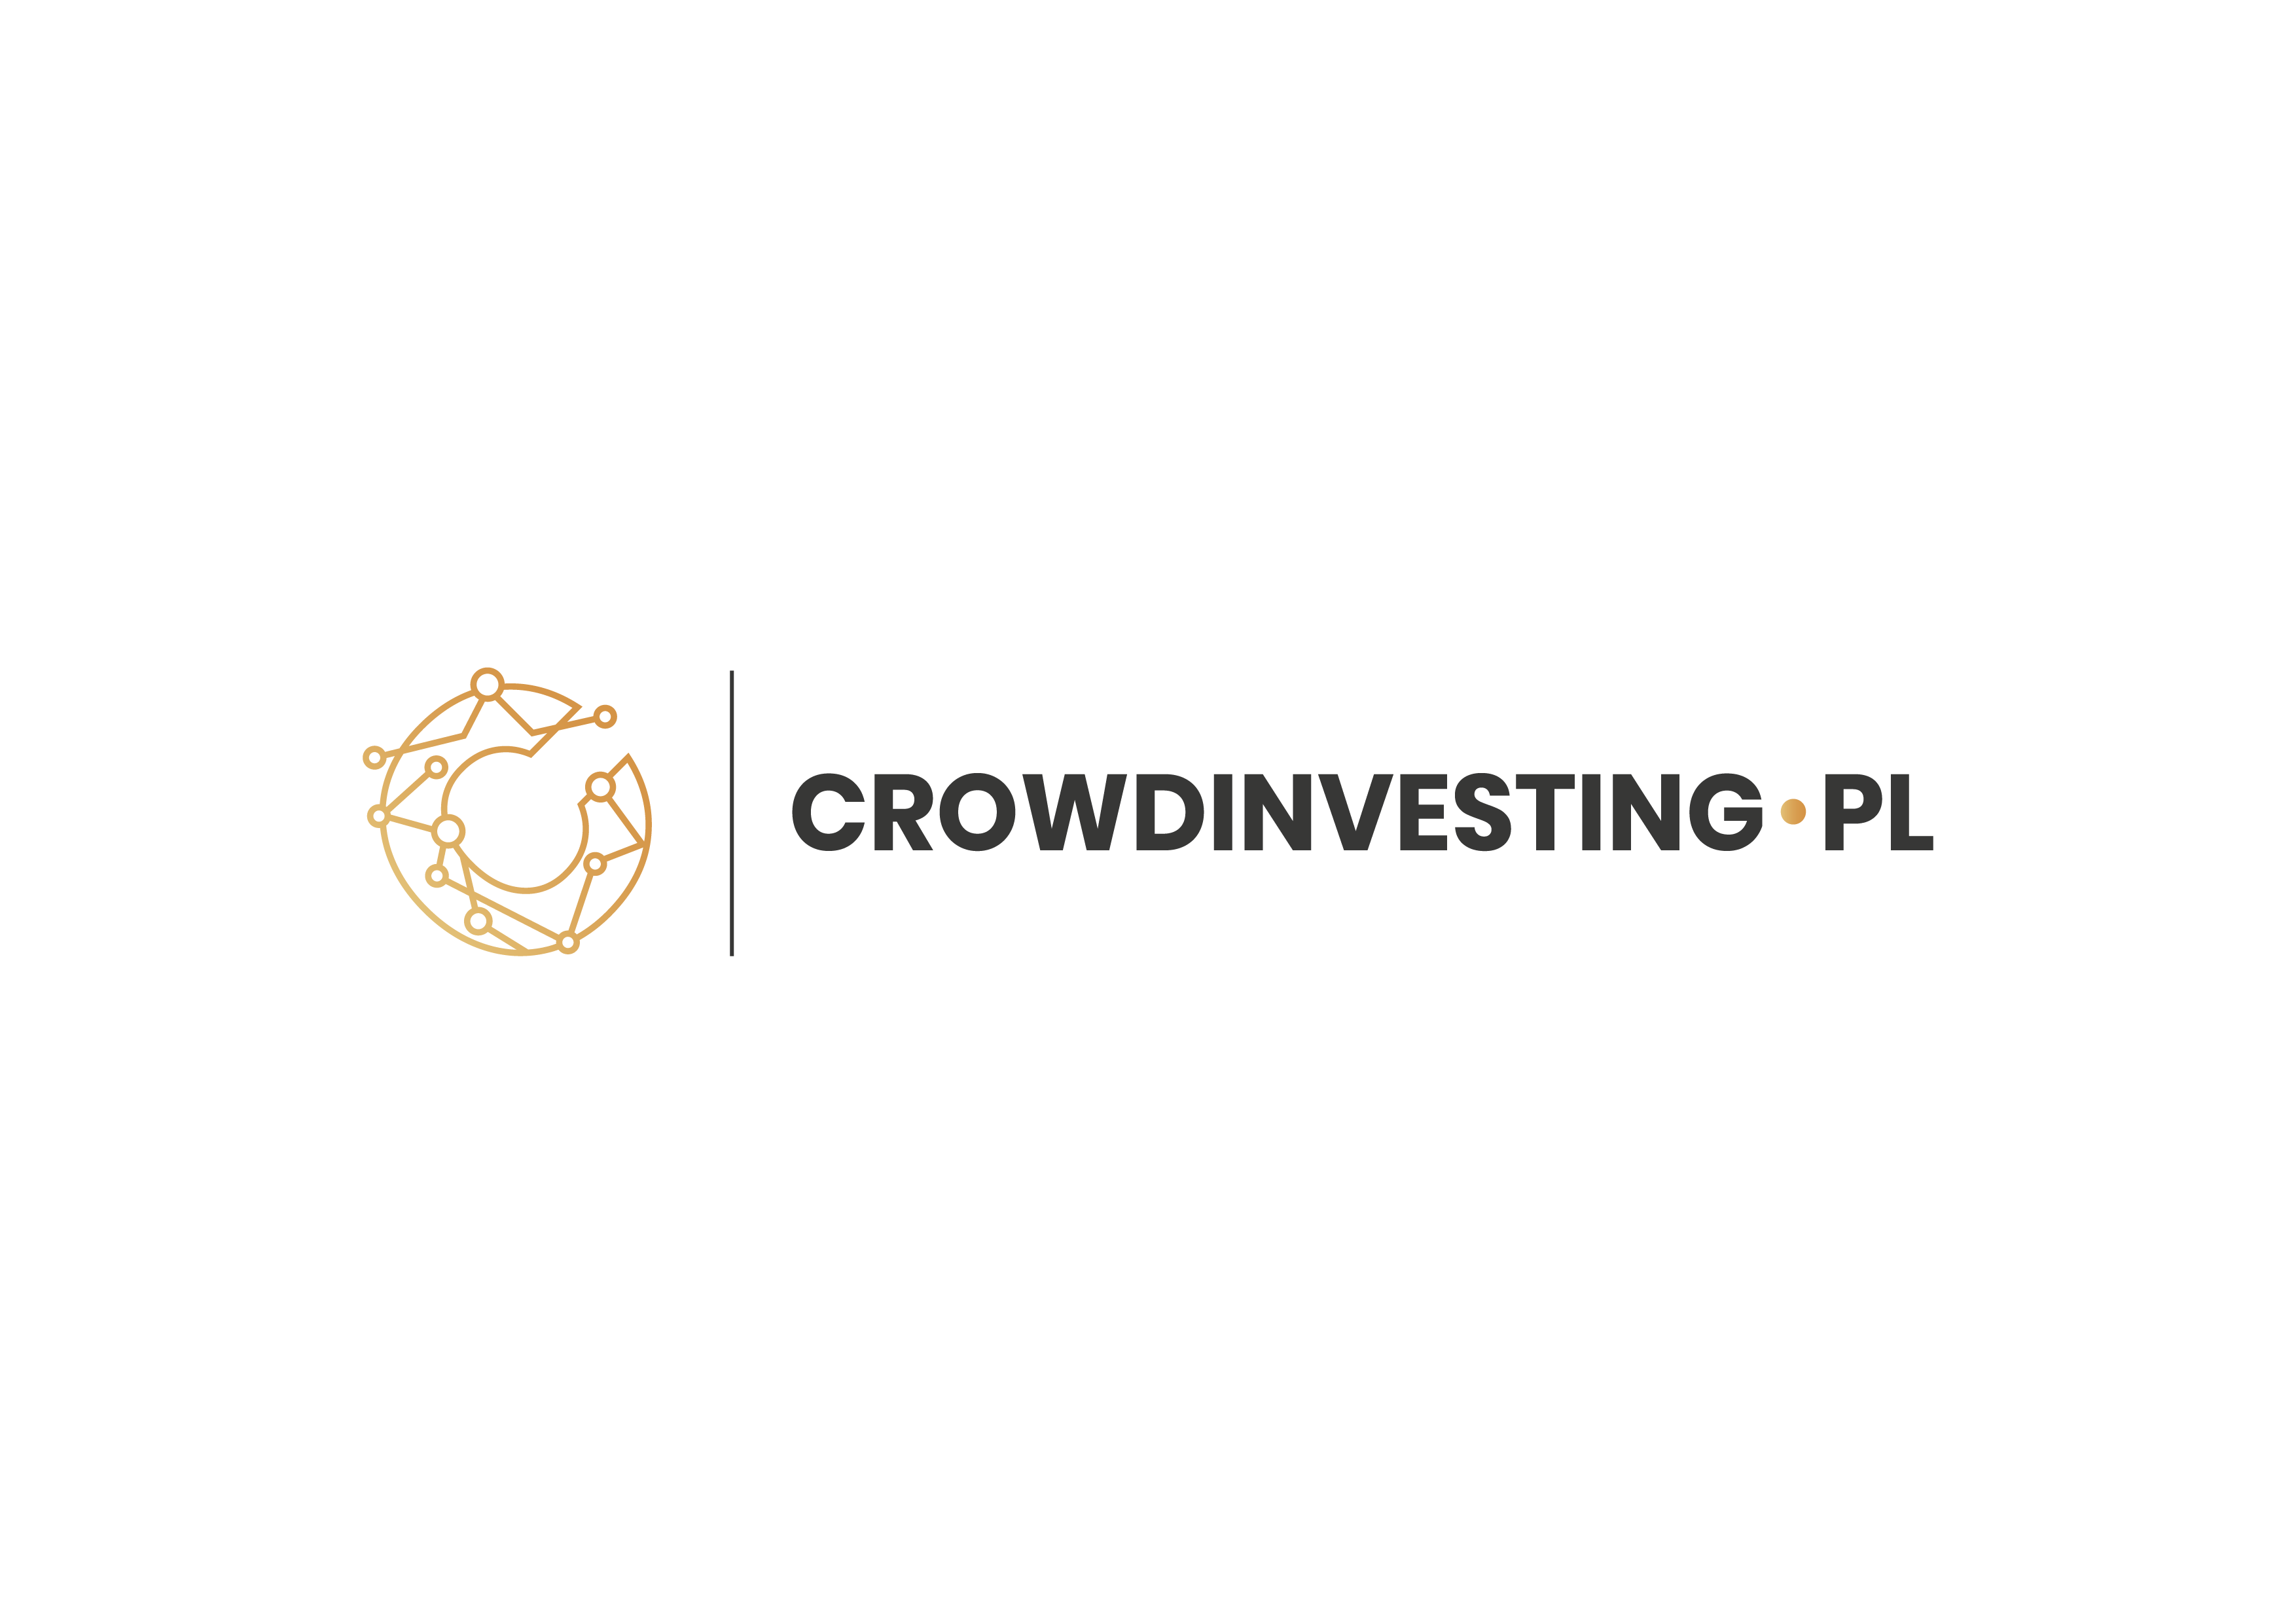 Crowdinvesting.pl